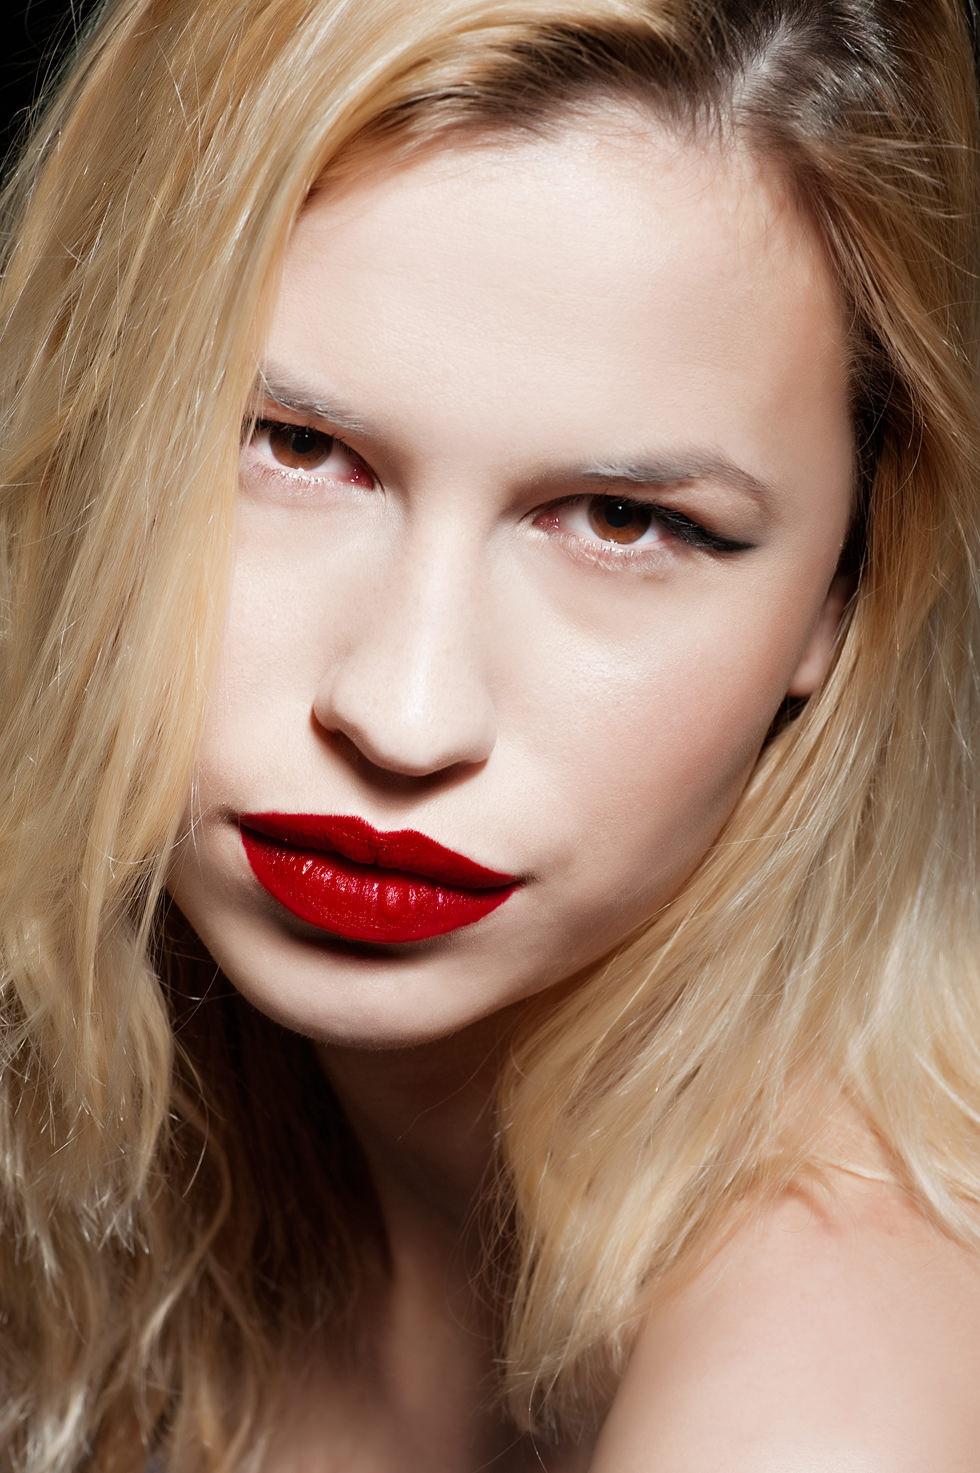 Portraits & Beauty 022.jpg